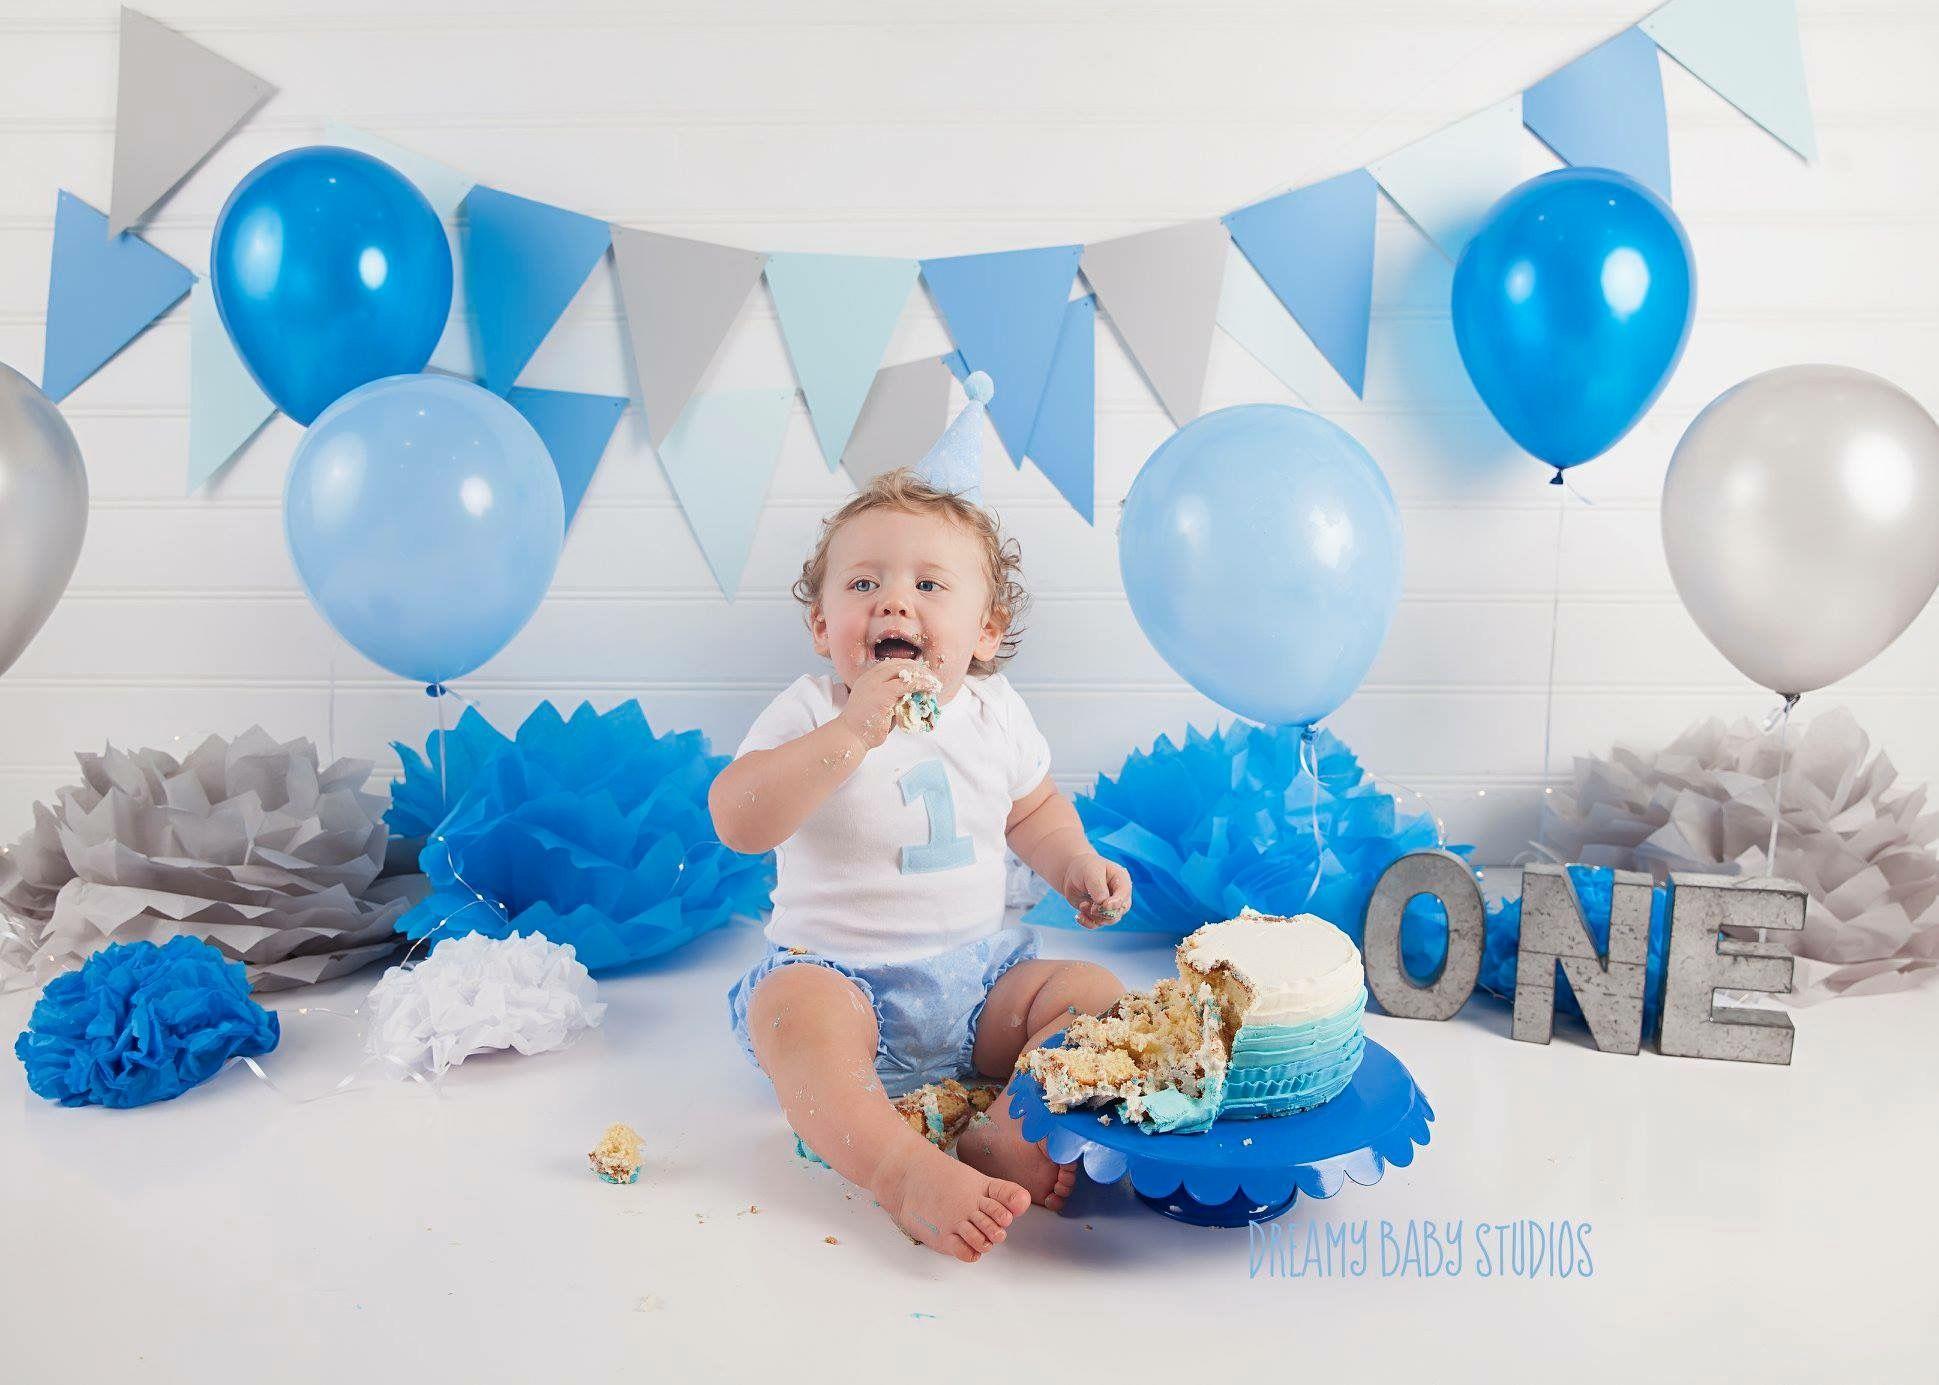 Boy Blue Cake Smash Virginia Beach Newborn First Year Photography Studio Dreamy Baby Studios Baby Cake Smash Cake Smash Blue Cakes